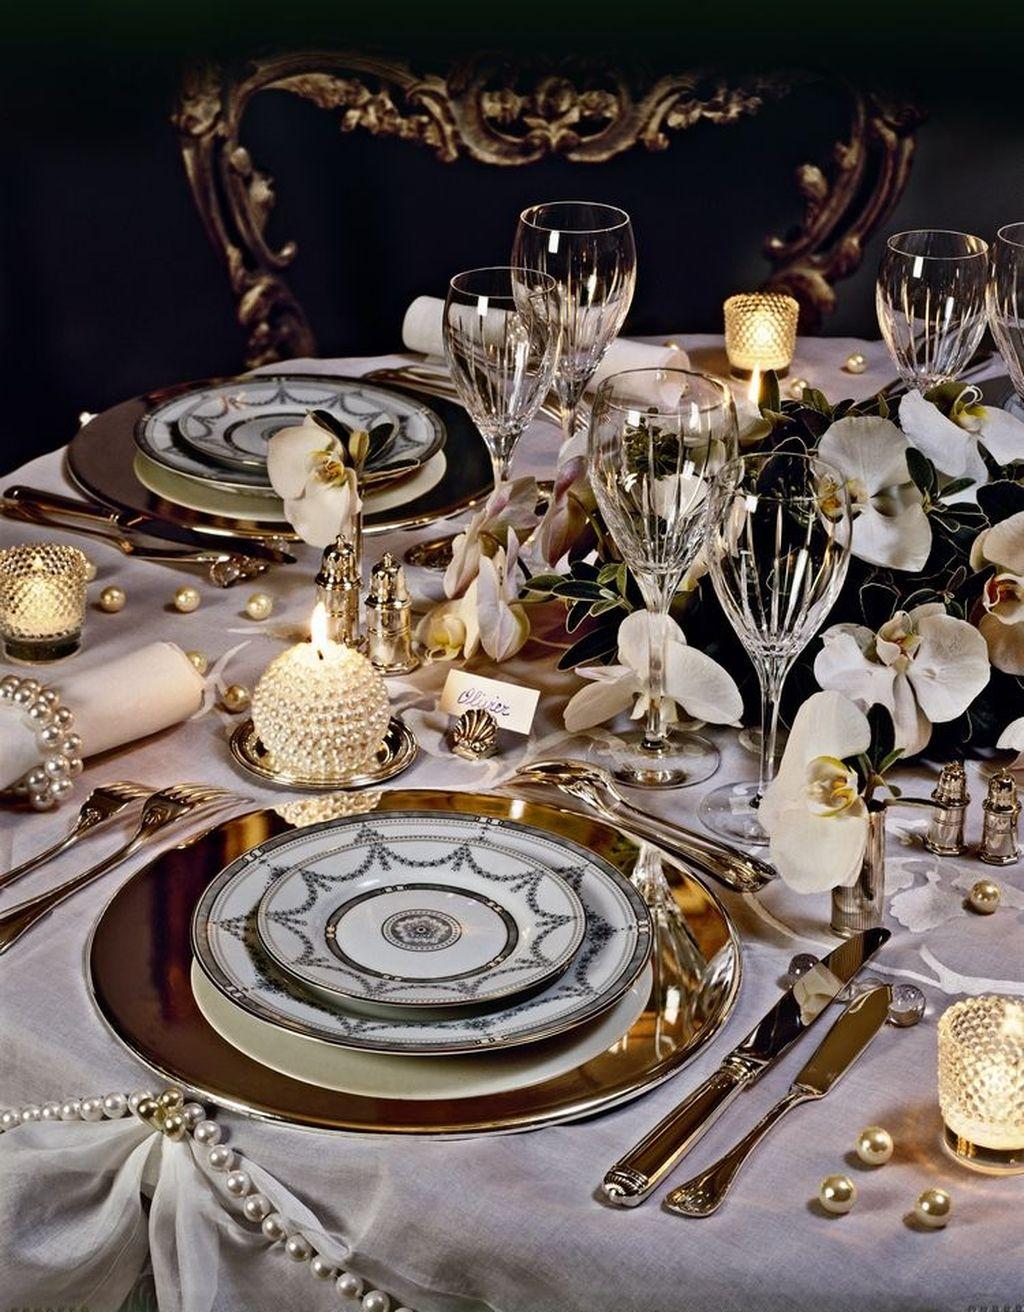 Inspiring Romantic Dining Table Decor Ideas 26